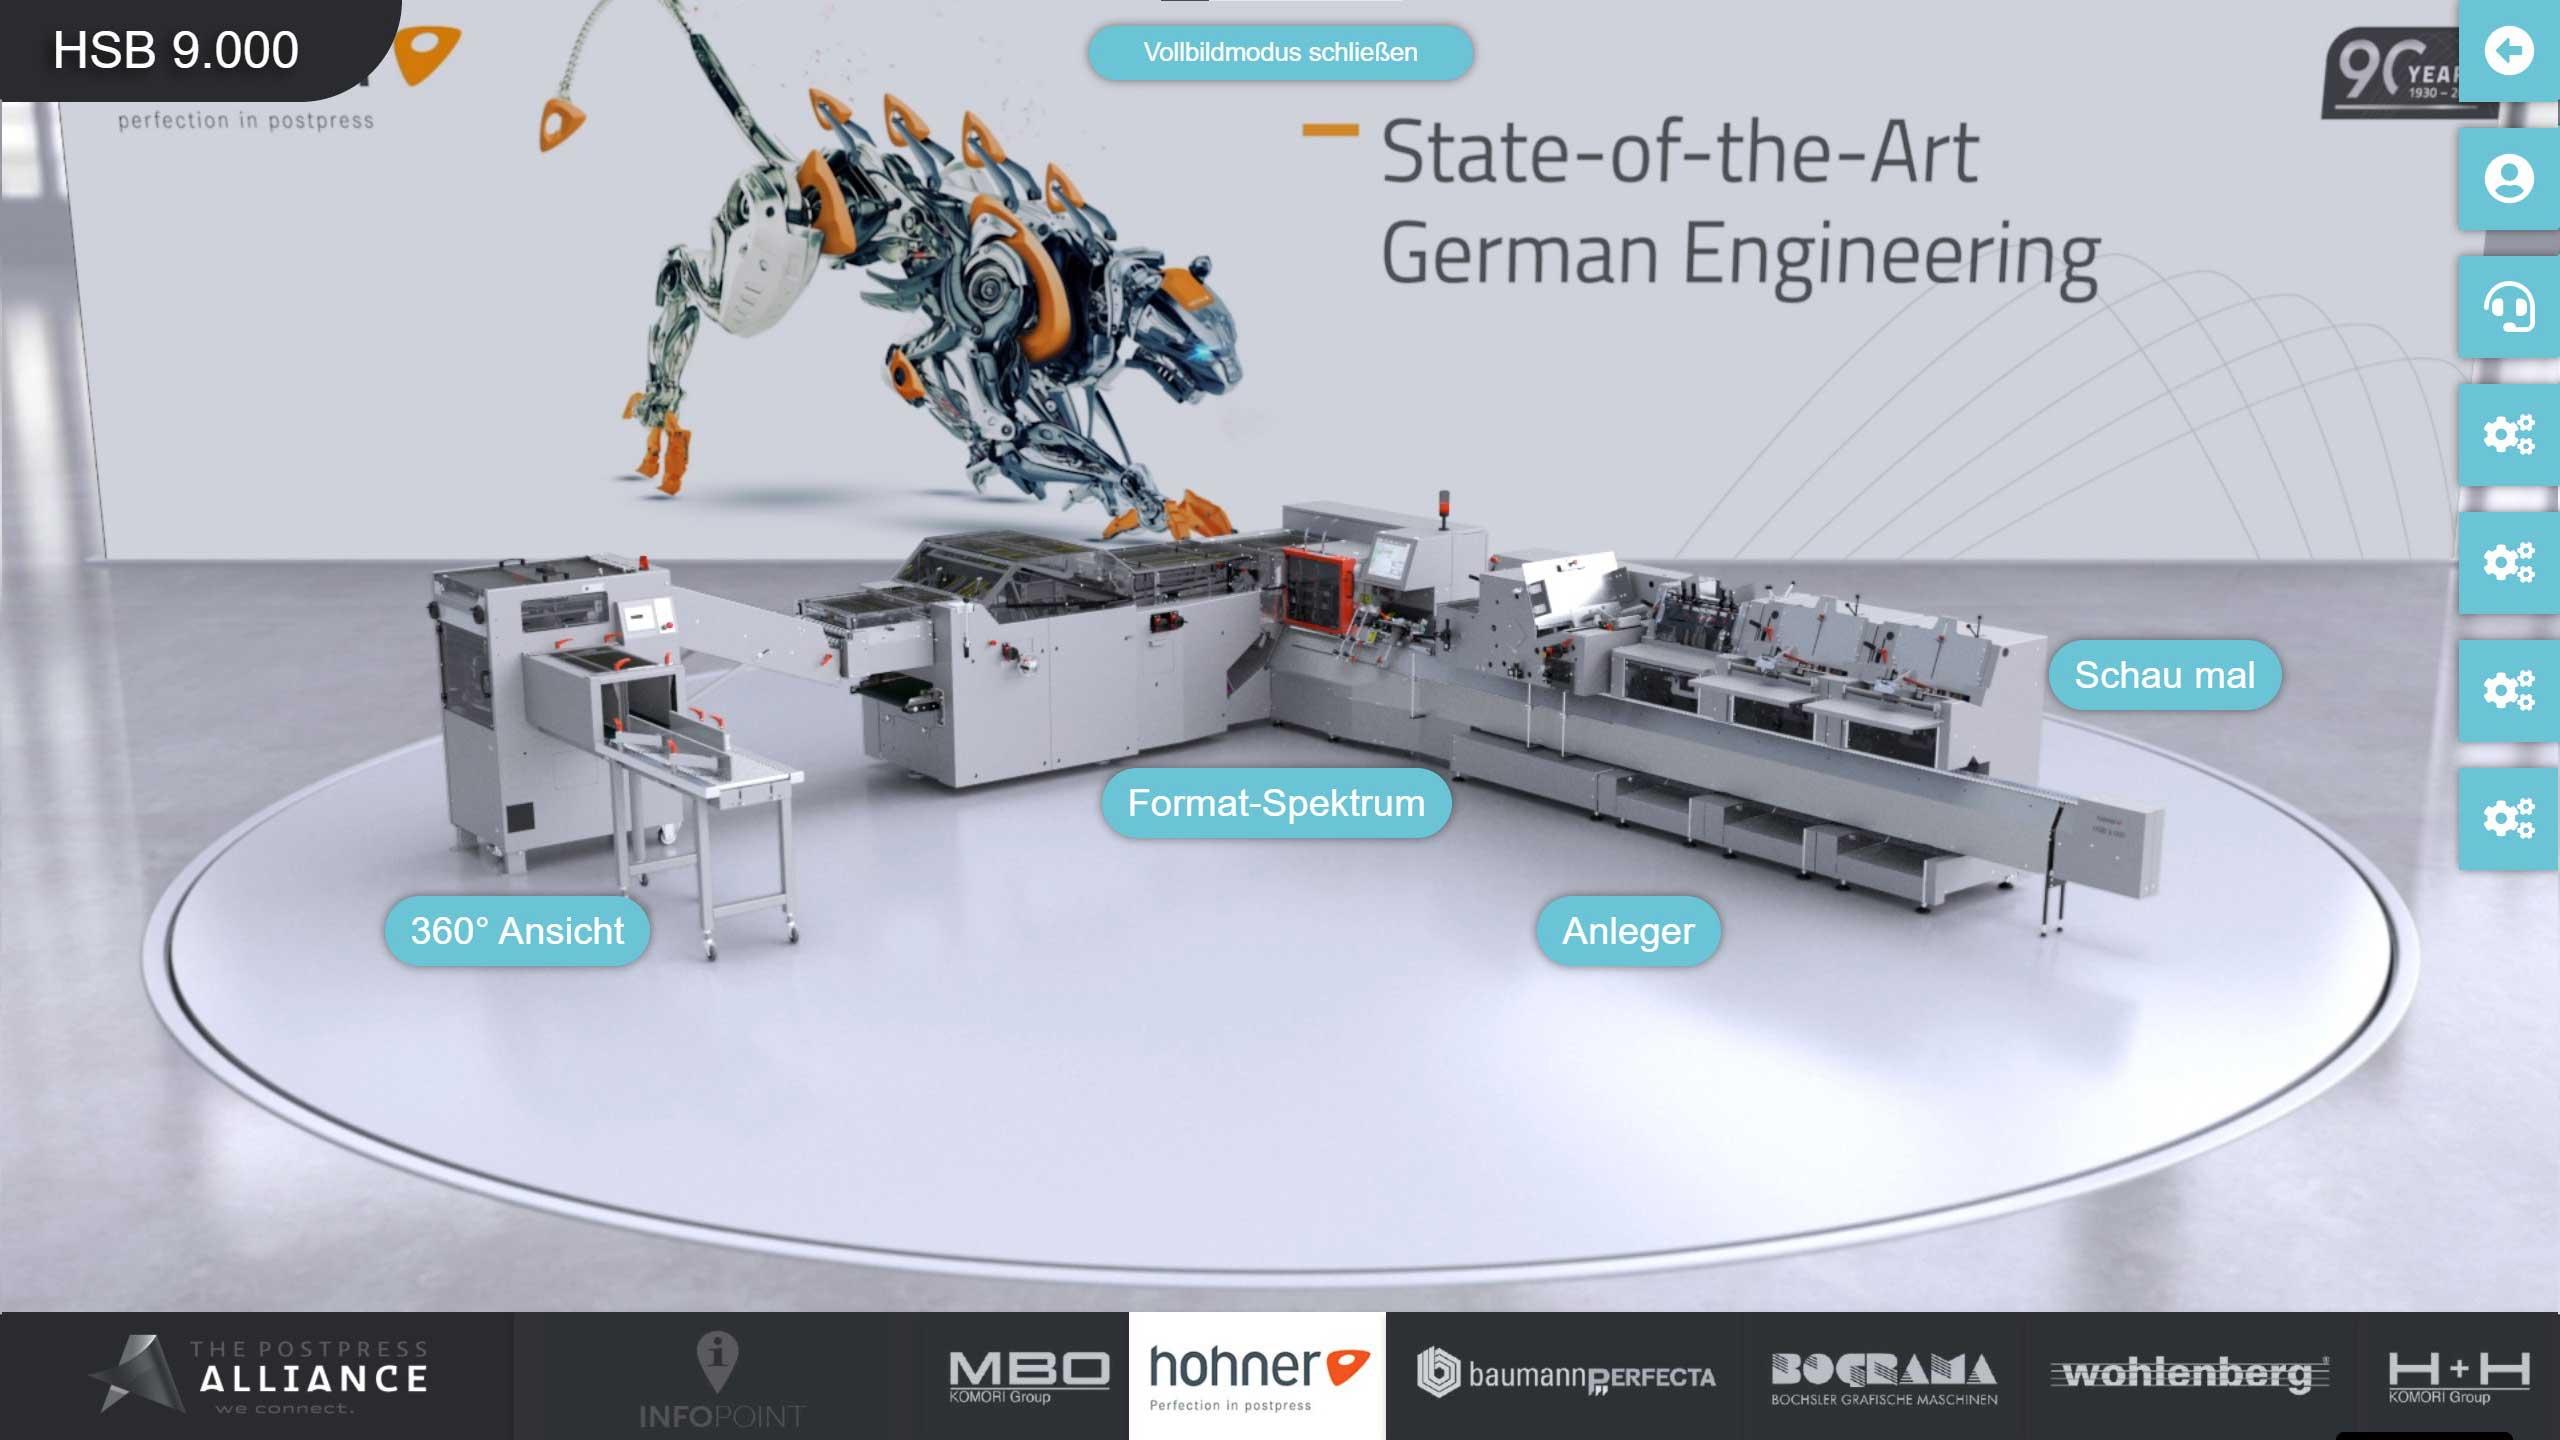 Virtueller Messestand von Hohner, designed by commalive.